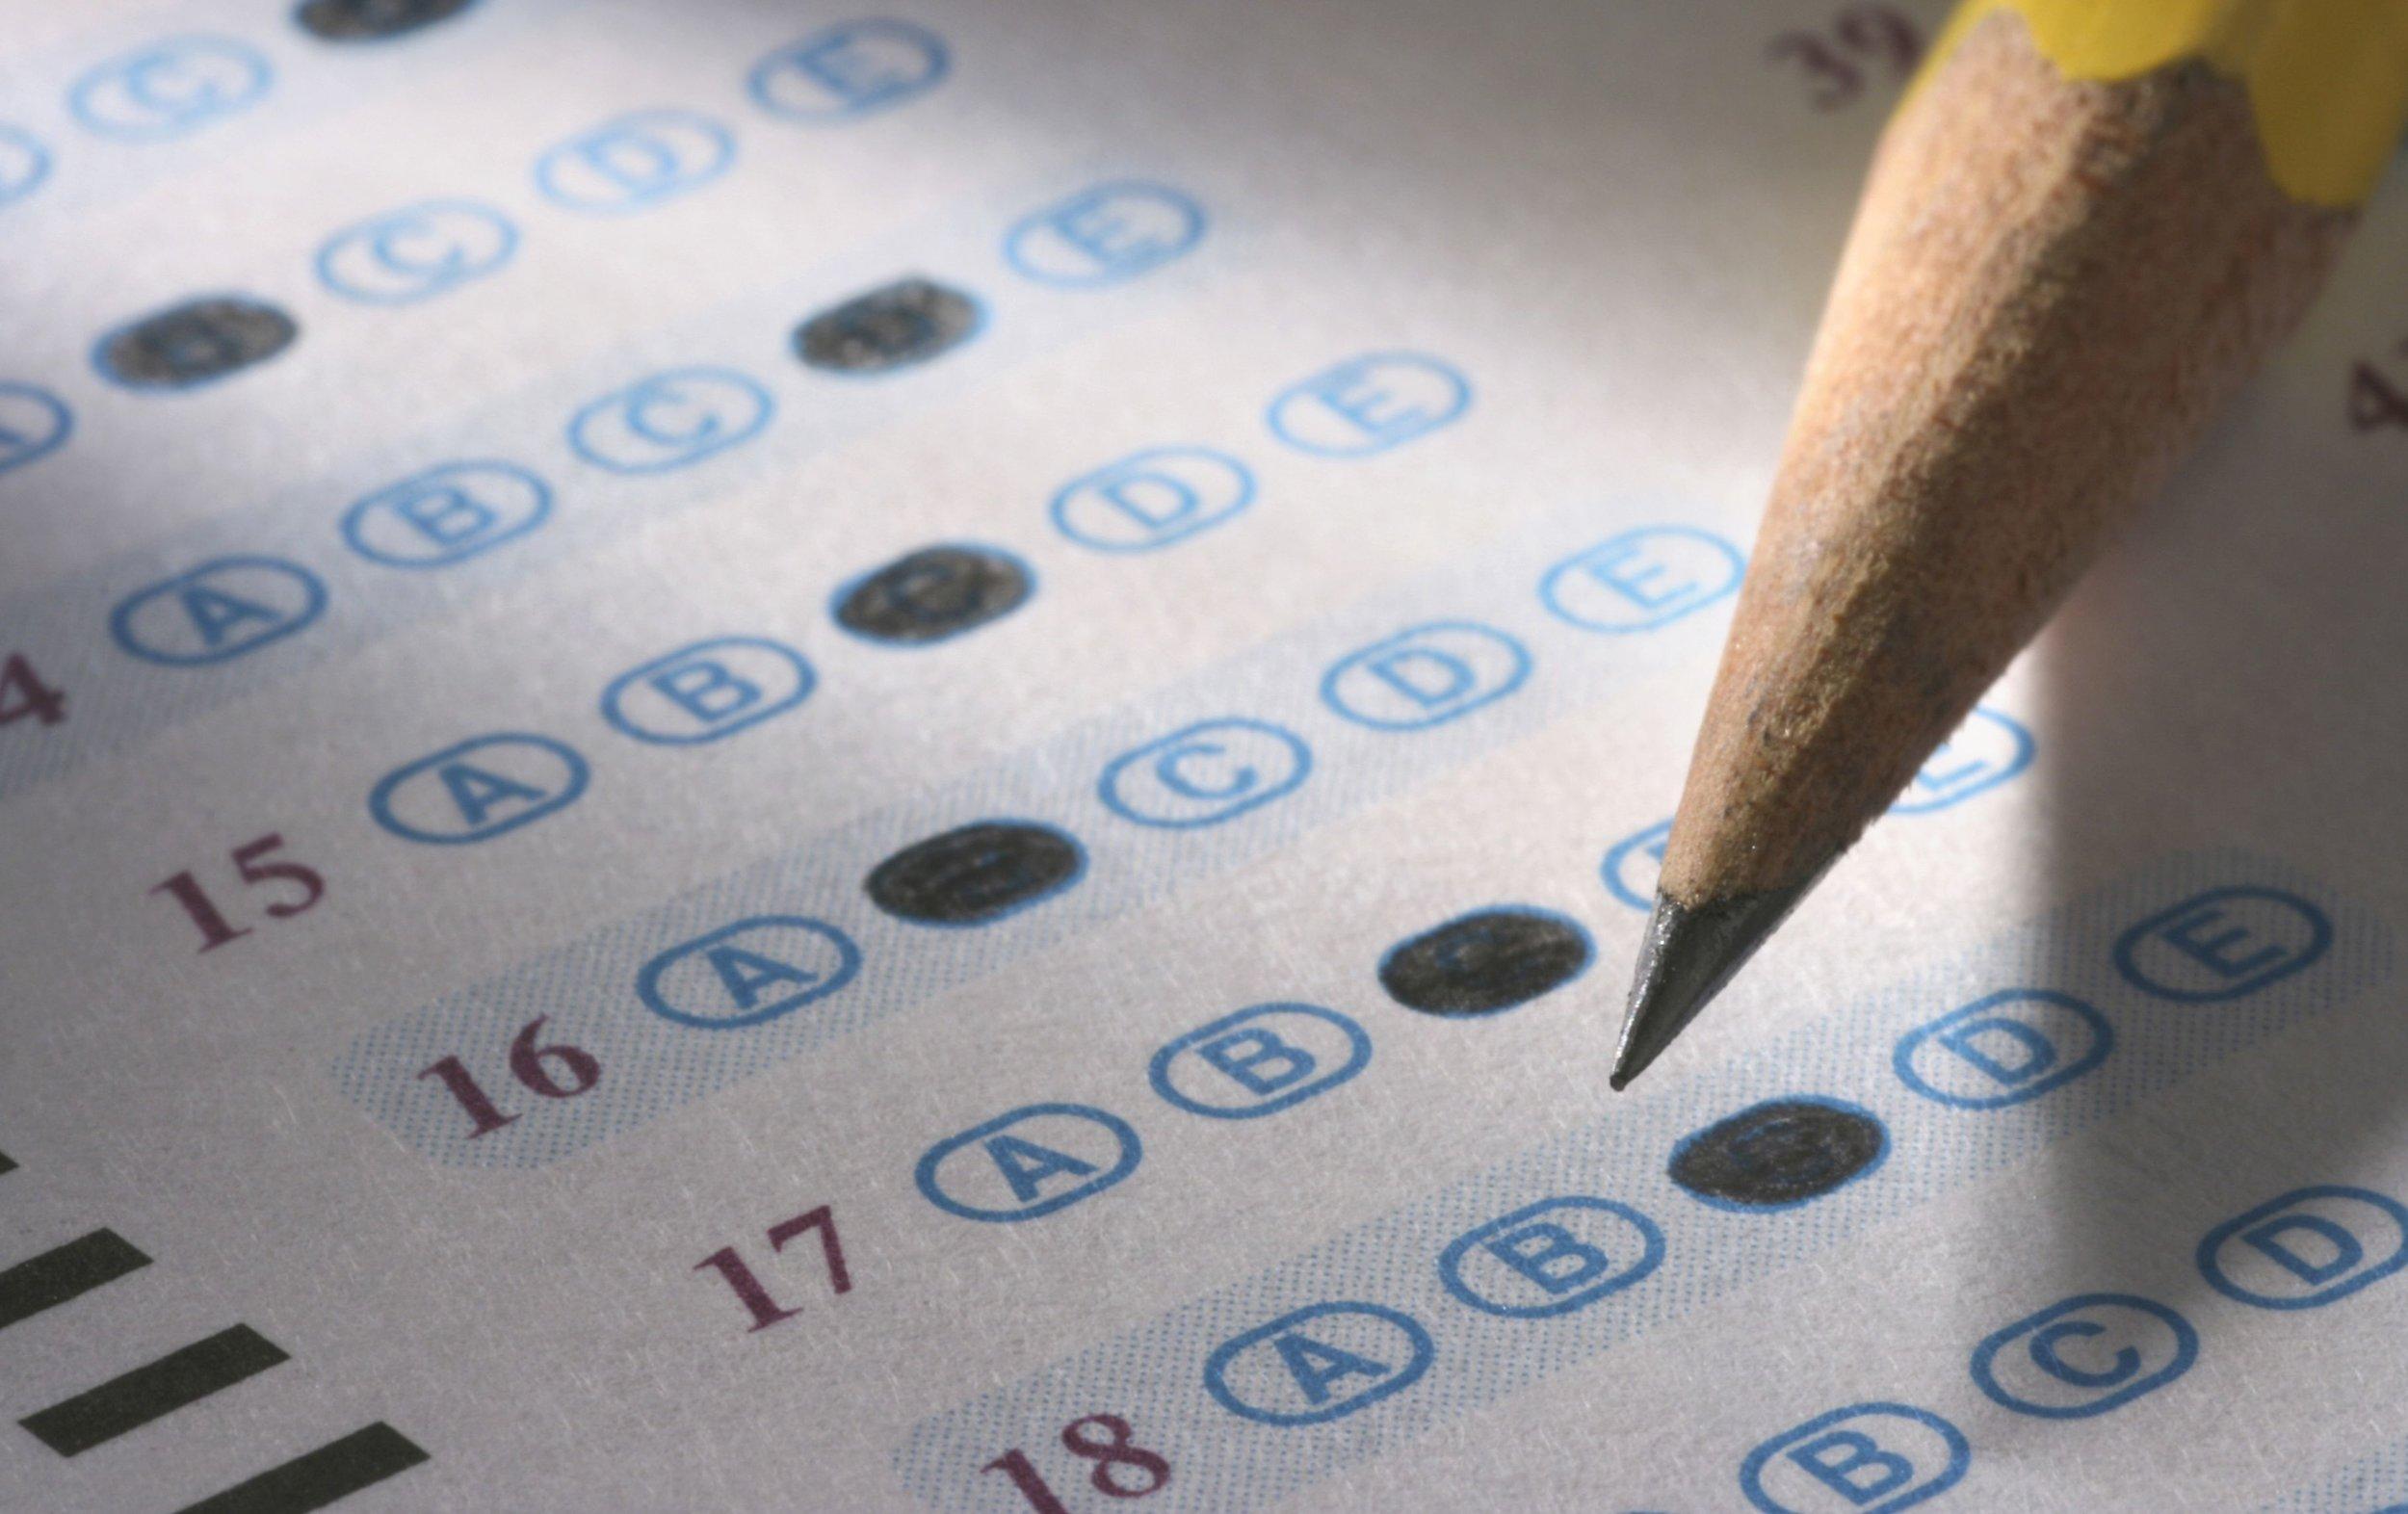 TOEFL, IELTS, FCE, CAE, CPE, BEC -